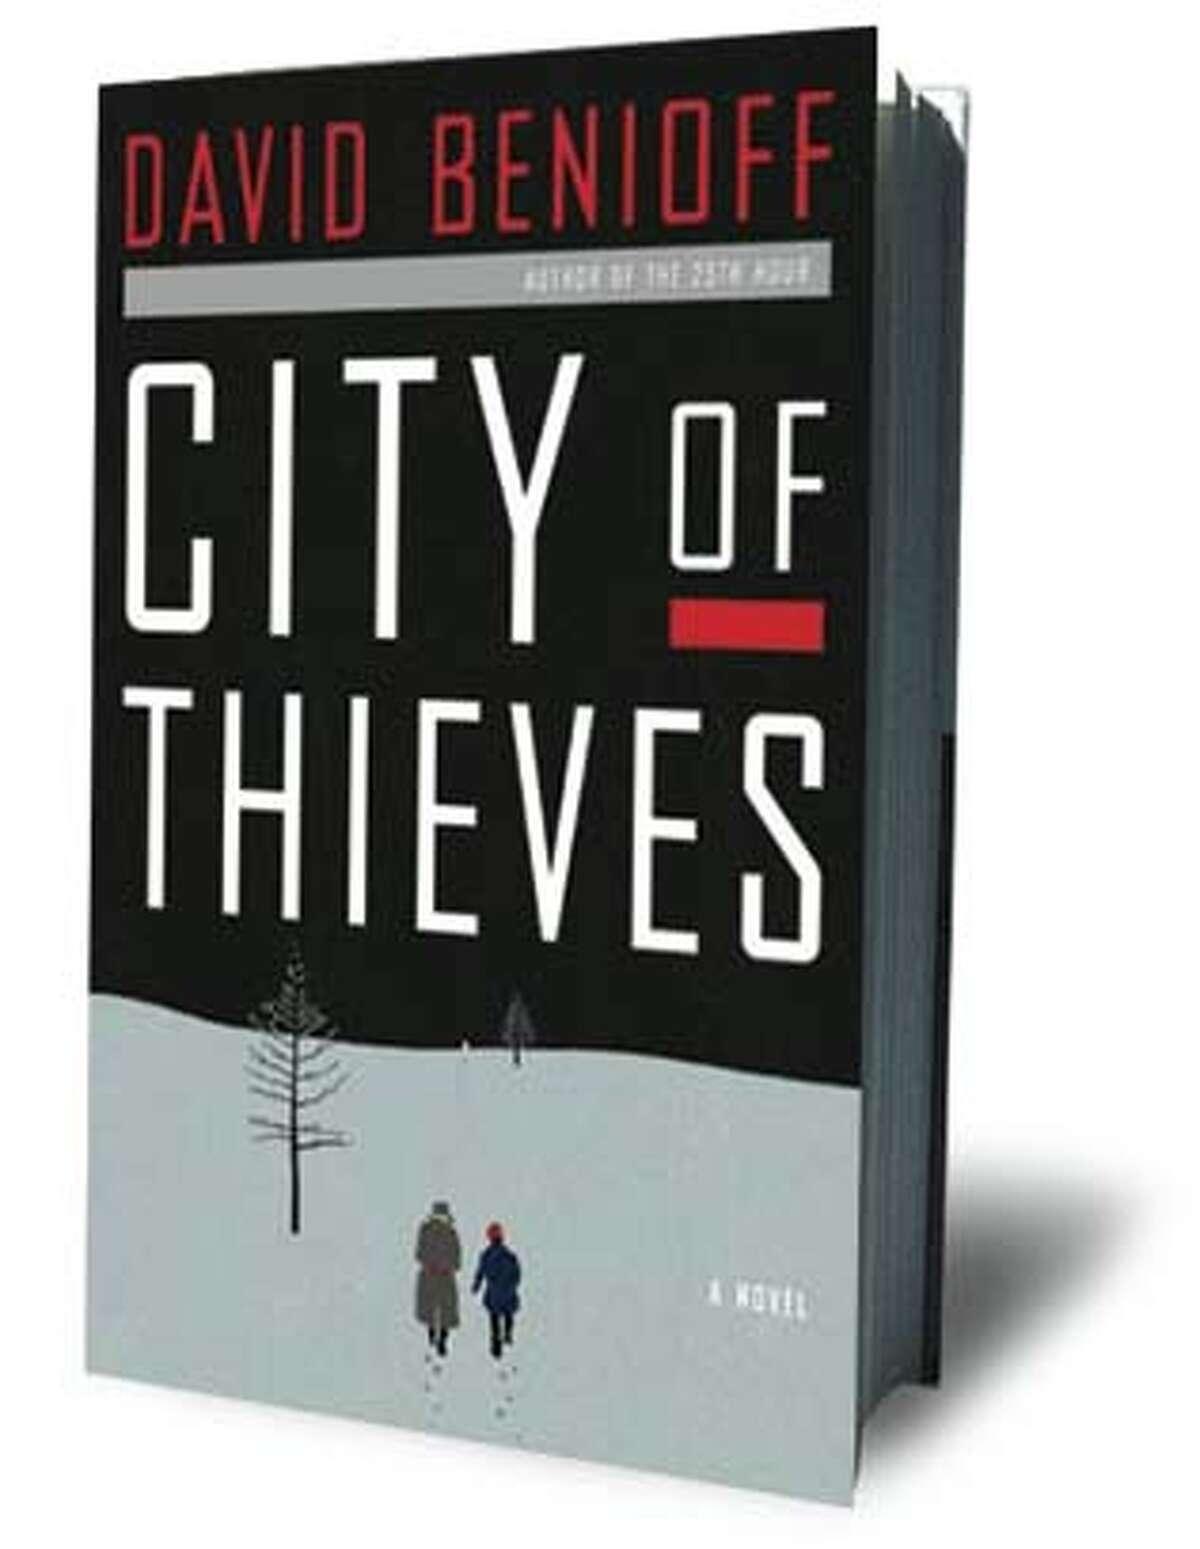 Cover of David Benioff's new novel